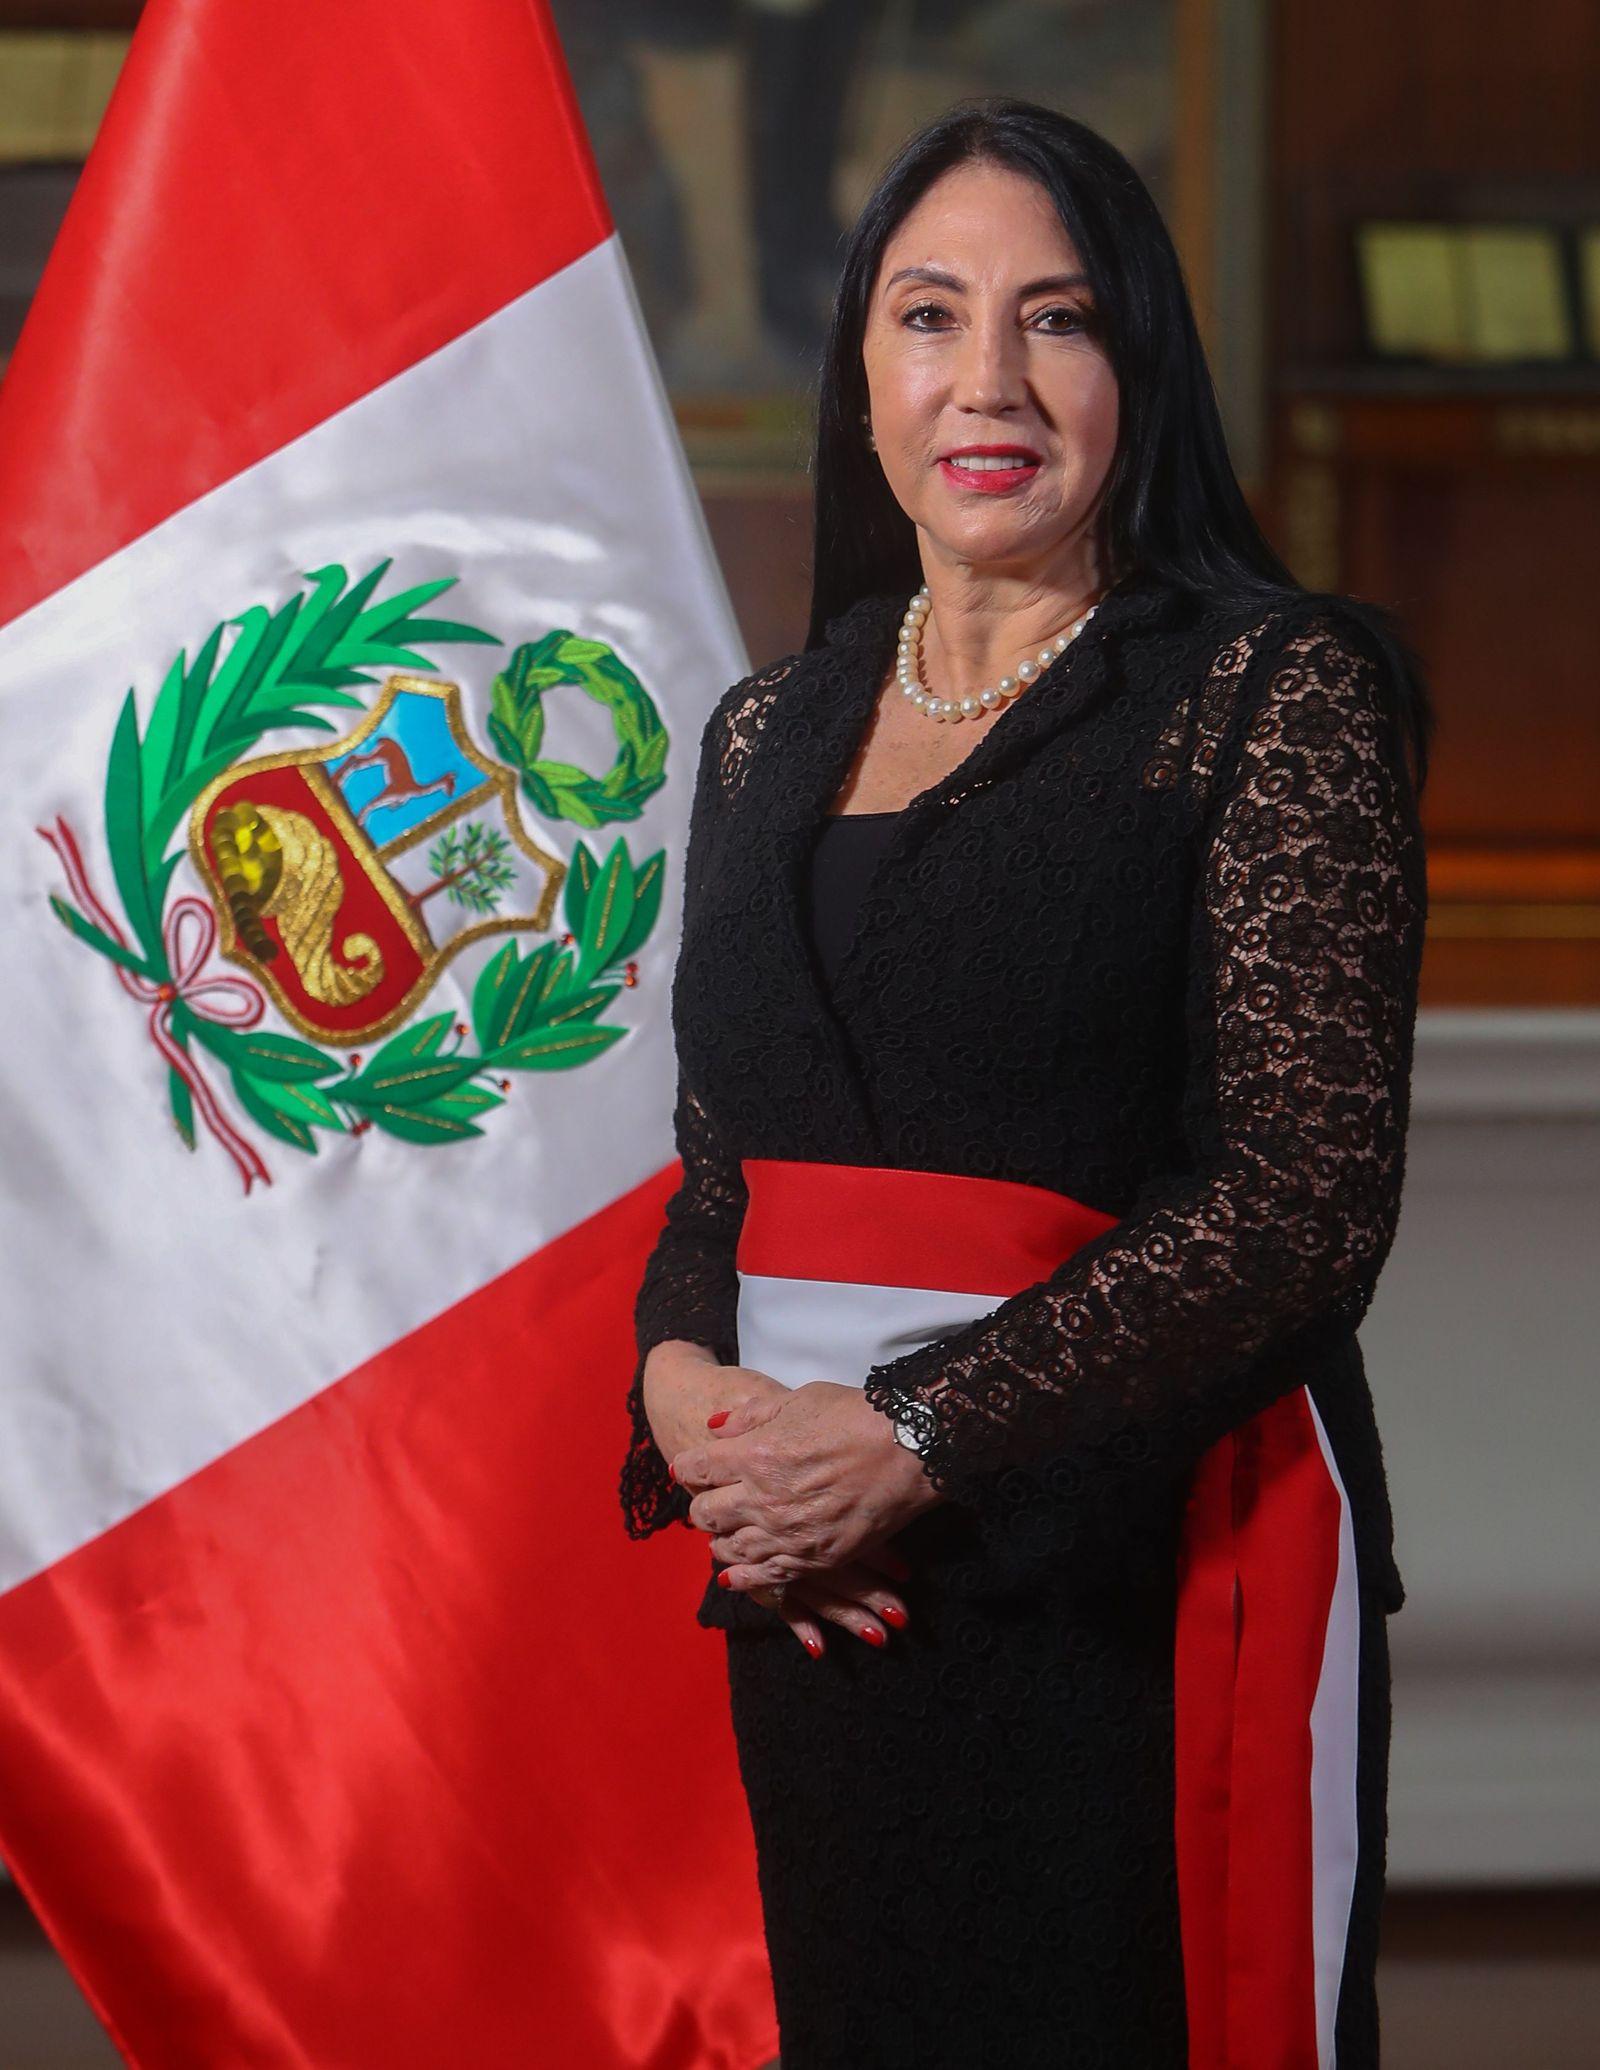 PERU-DIPLOMACY-MINISTER-ASTETE-RESIGNATION-HEALTH-VIRUS-VACCINE